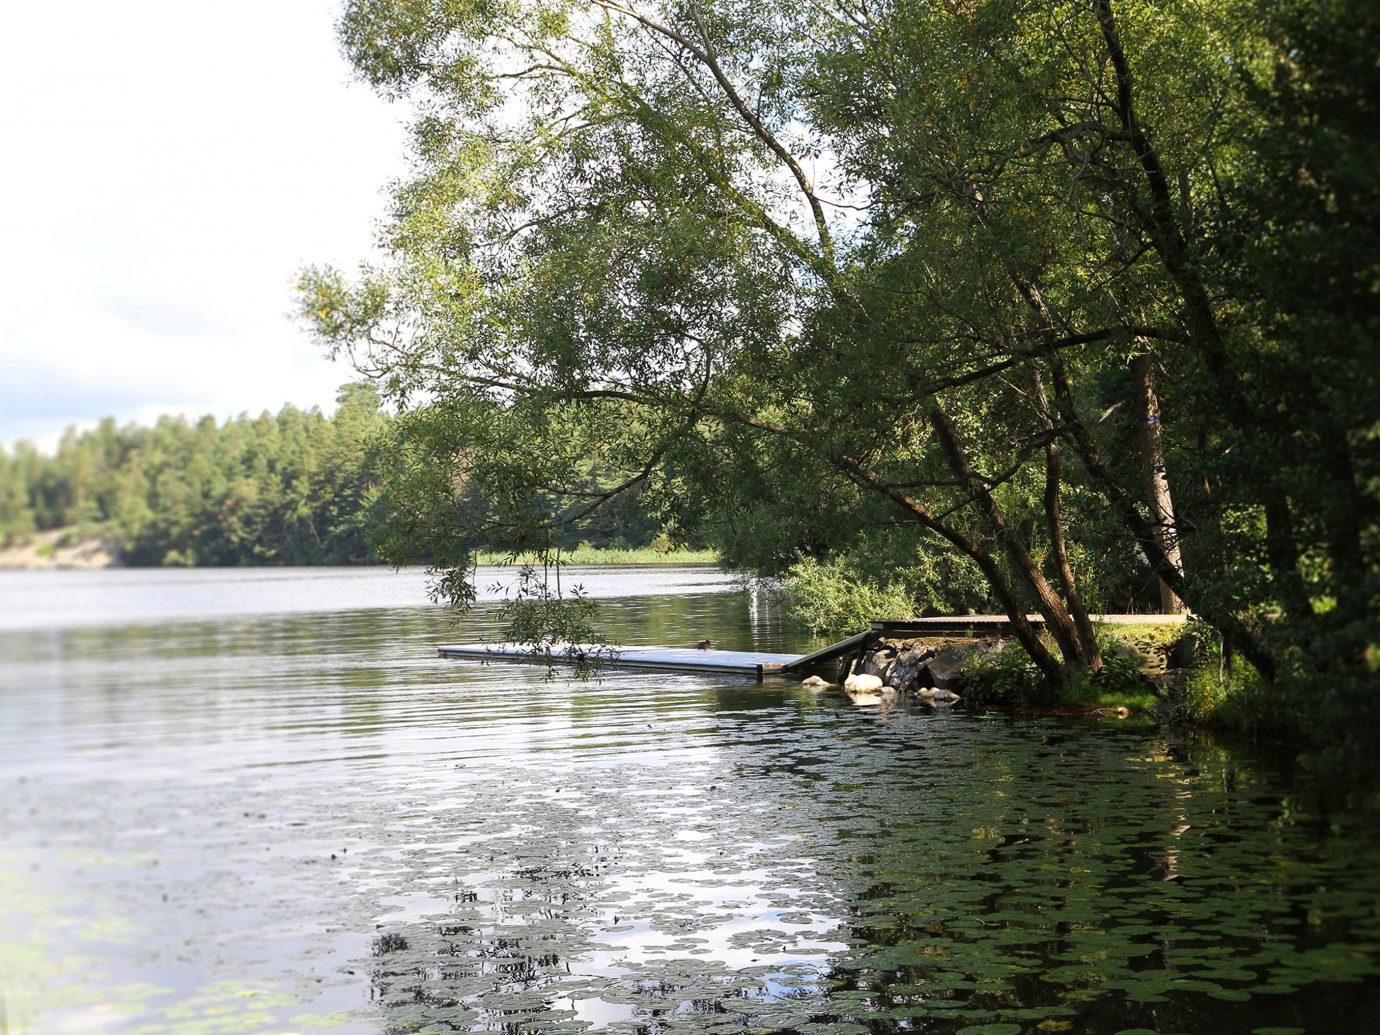 Denmark Finland Hotels Landmarks Luxury Travel Sweden tree outdoor water bayou Nature body of water River Lake pond waterway wetland reservoir day